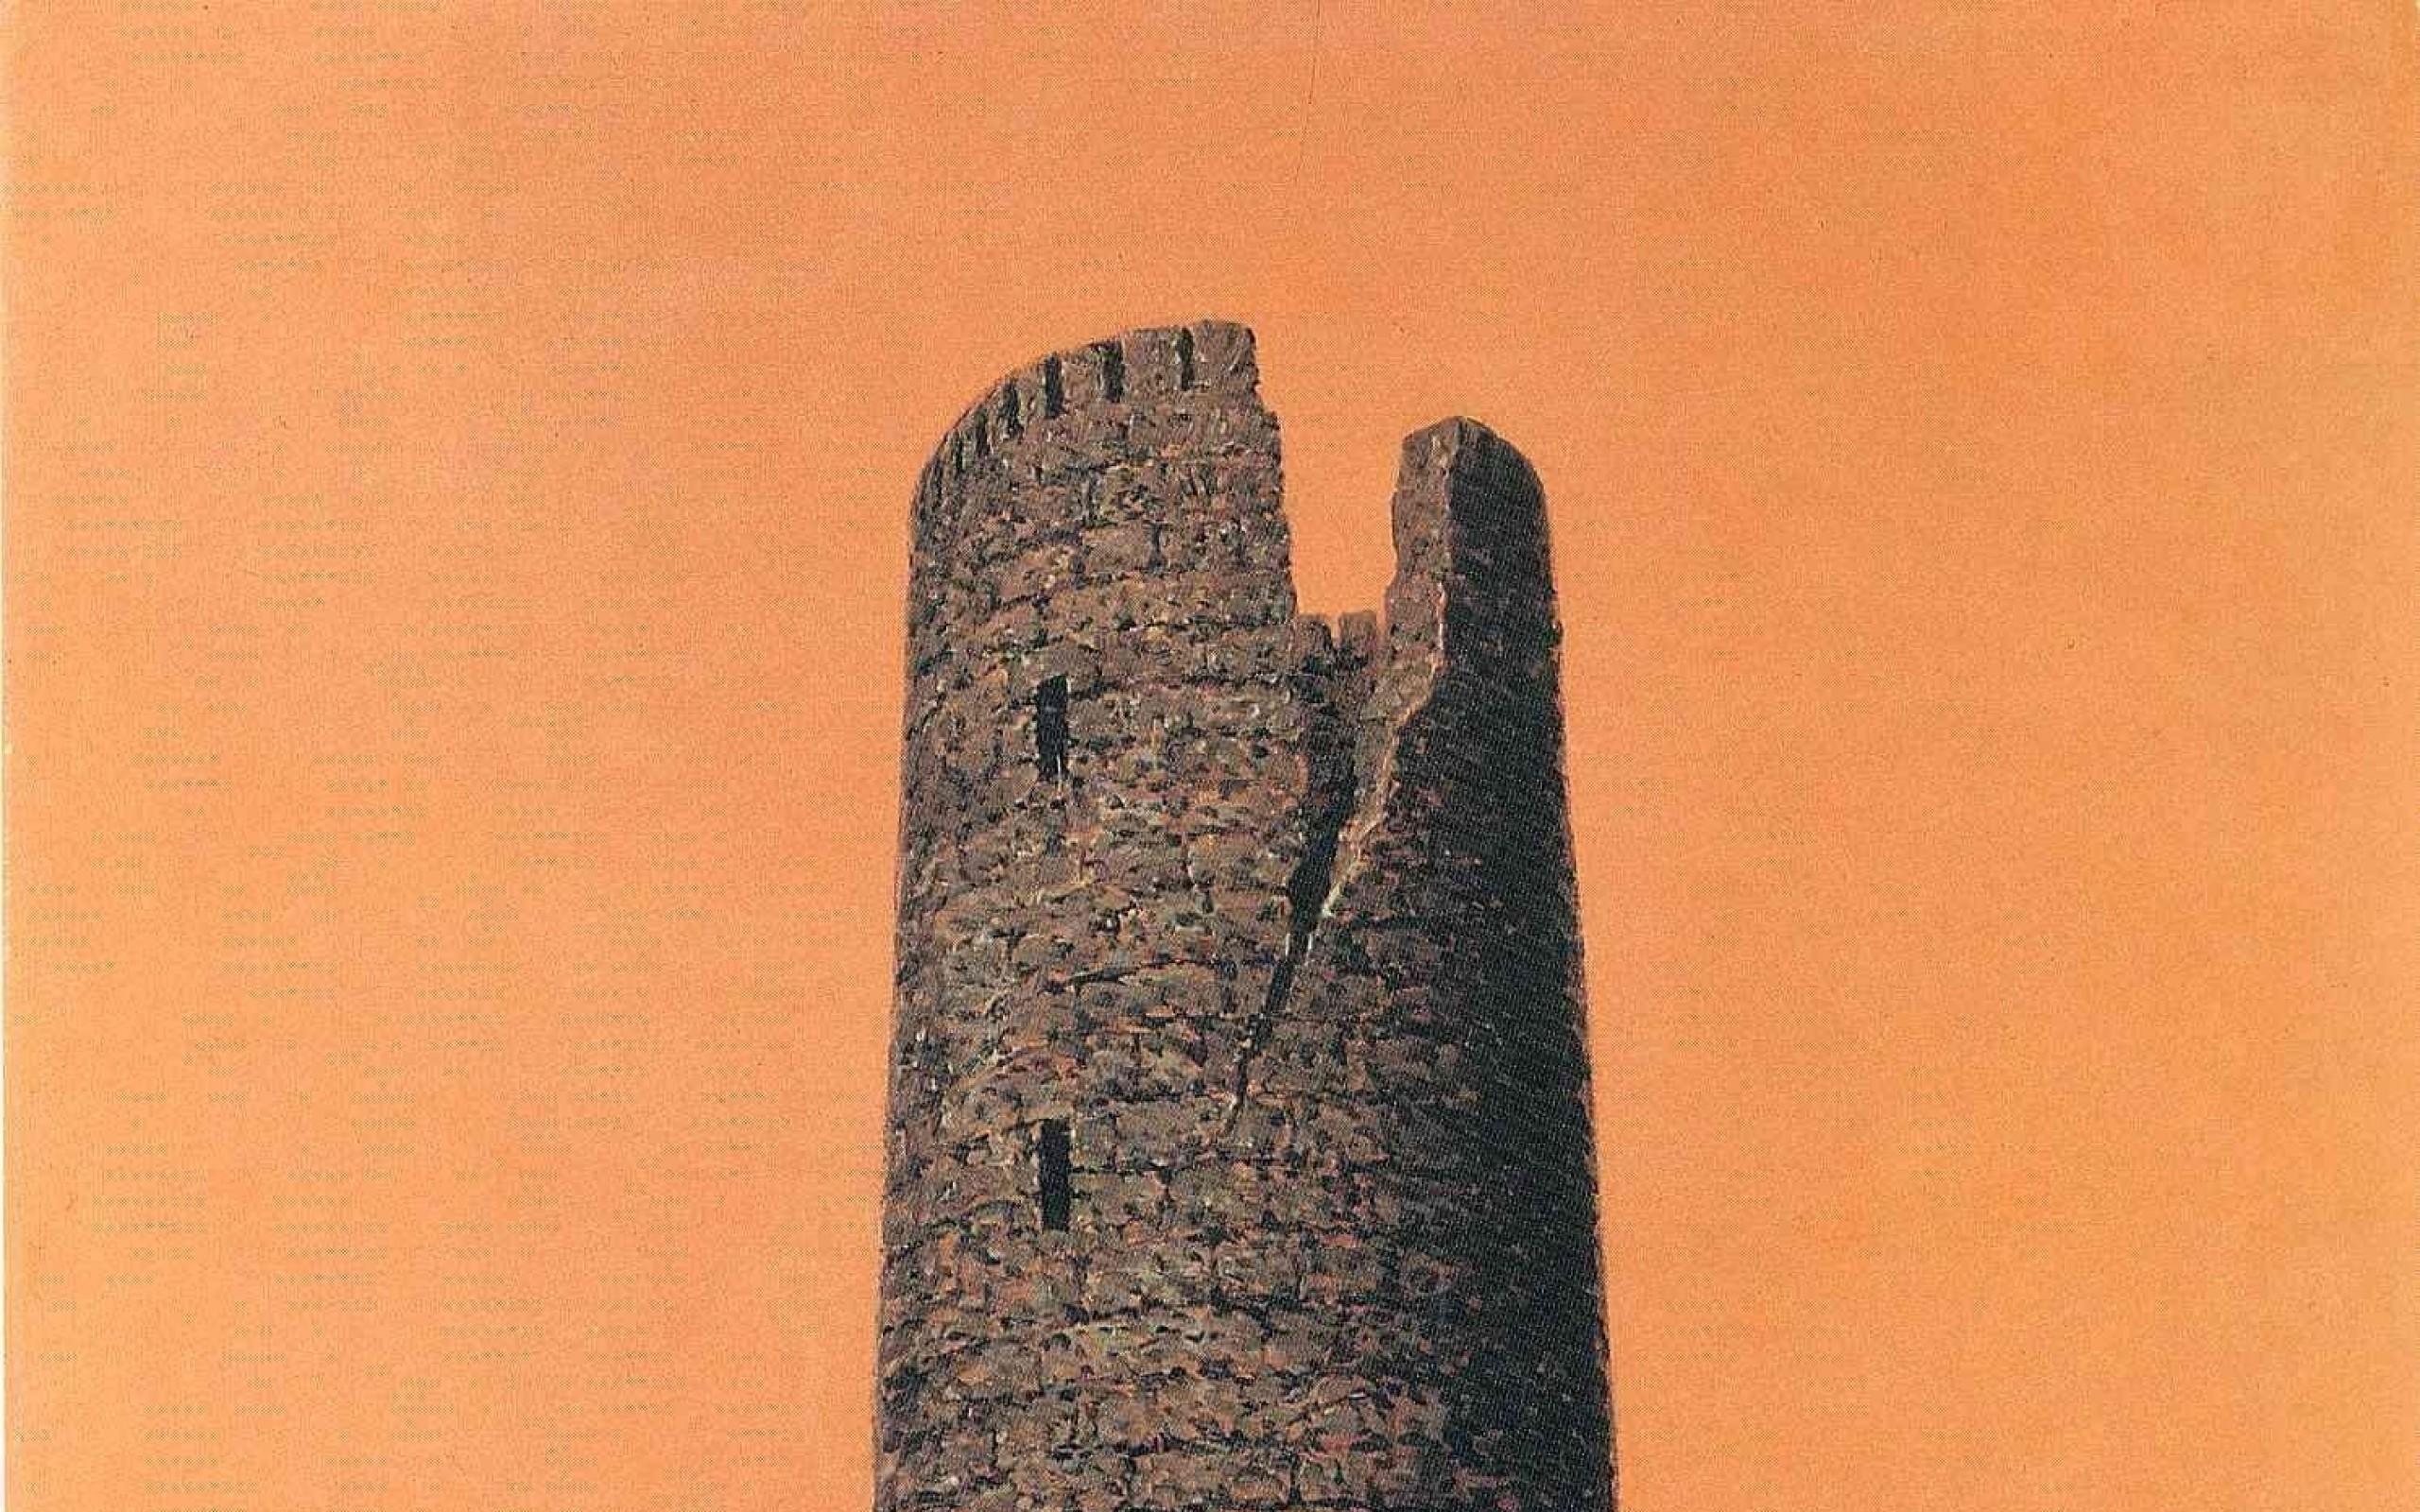 paintings castles surrealism artwork roots traditional art rene magritte  orange background belgian Art HD Wallpaper